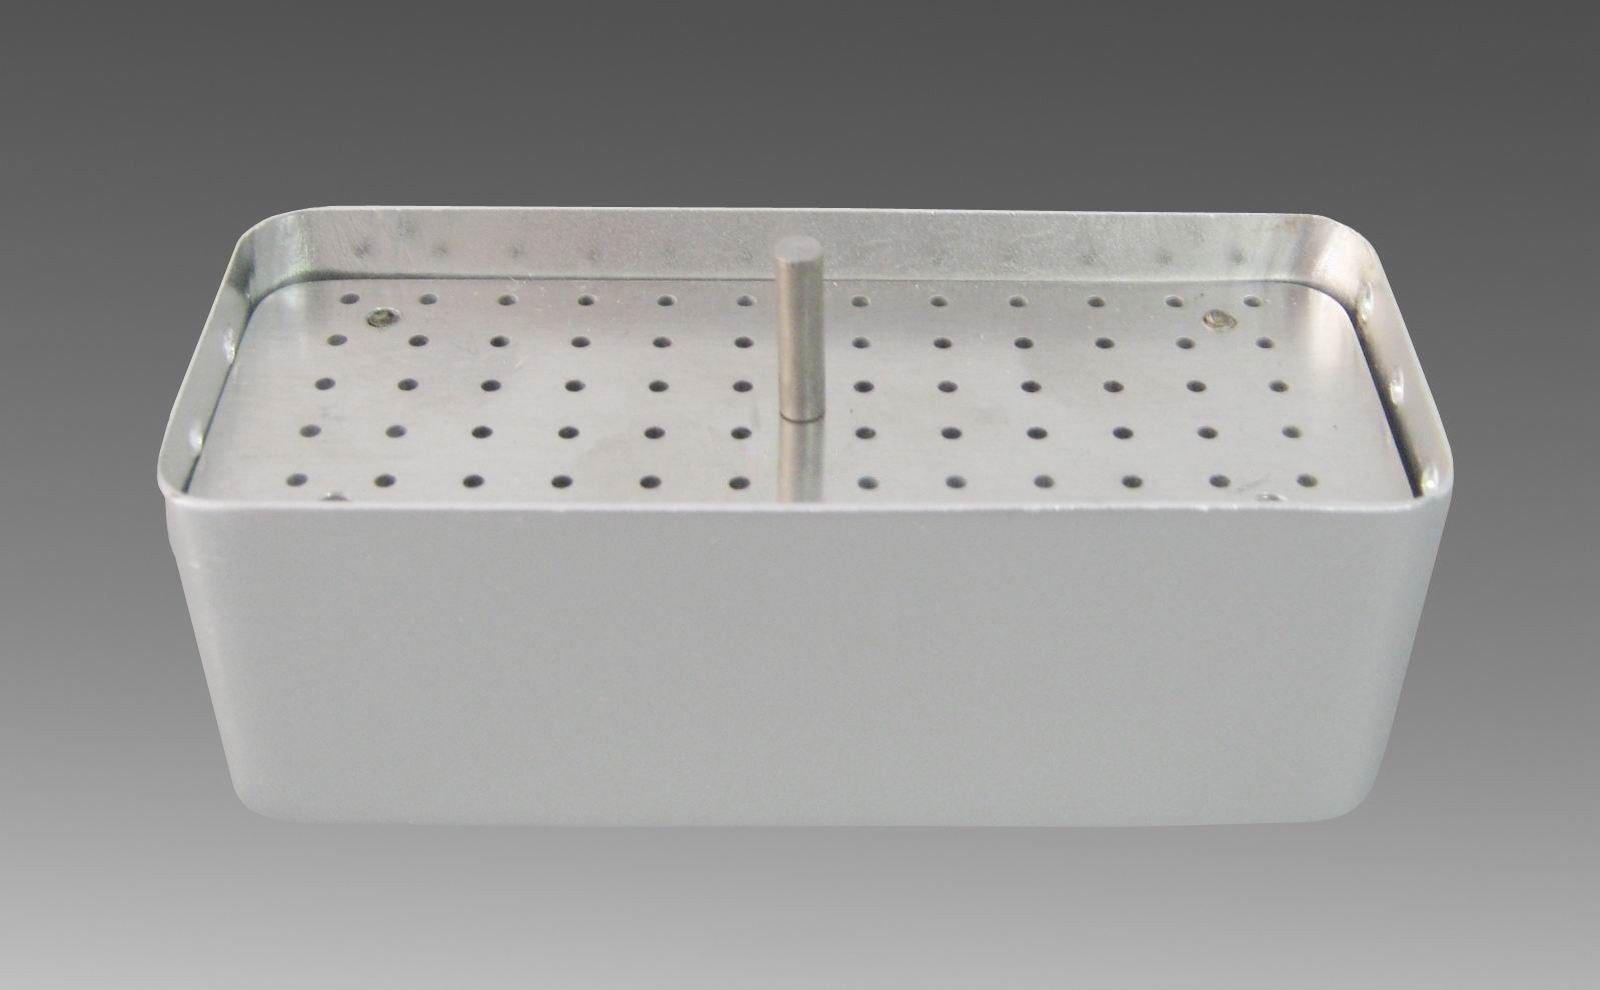 Aphrodite 72 Holes Bur Holder Sterilizer Case Disinfection Box 3 Used Silver Dual core